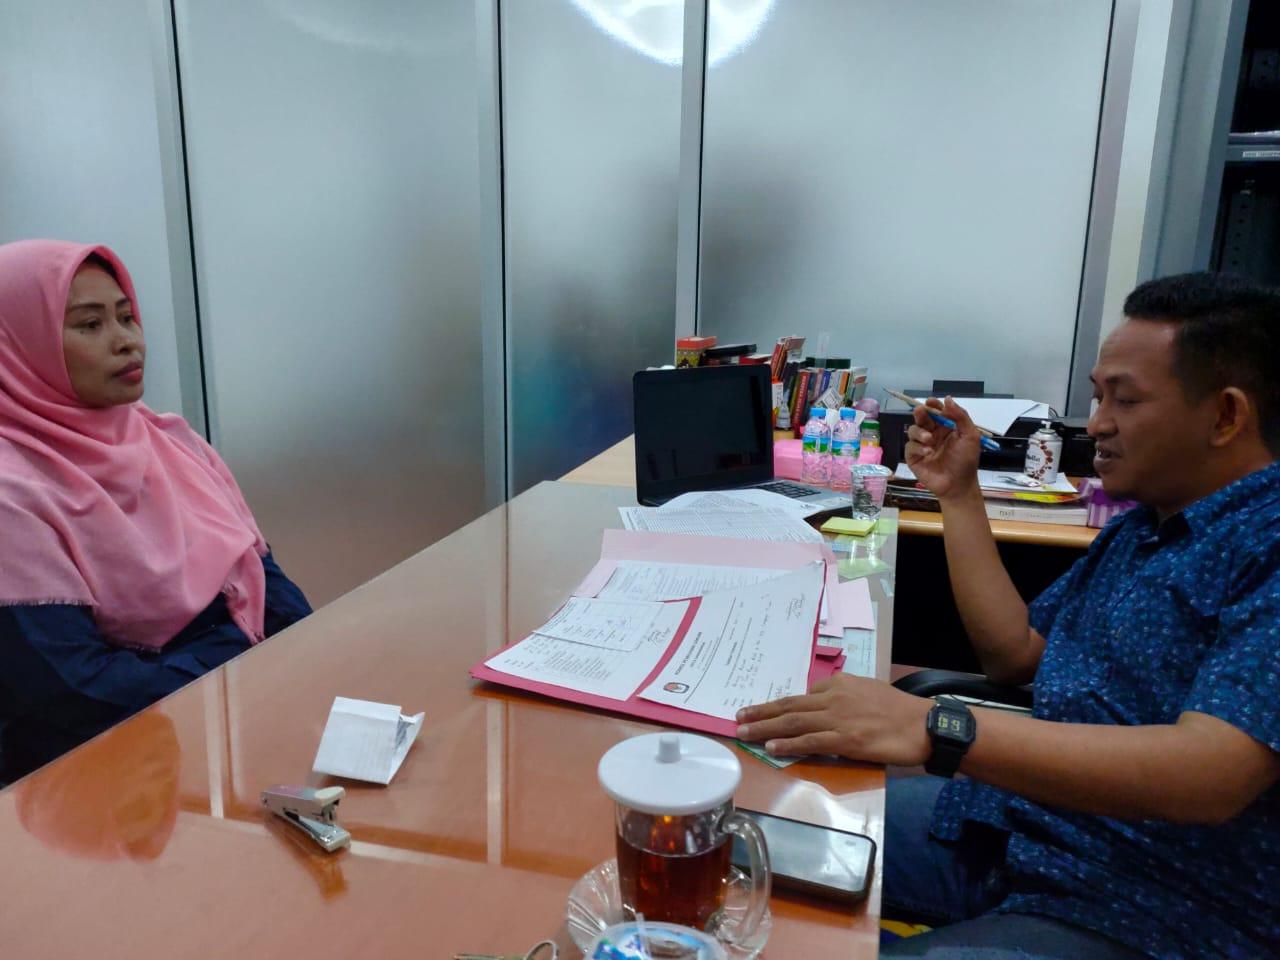 Teks: Najib saat tes wawancara PPK beberapa waktu lalu. Menyusul tes wawancara PPS.